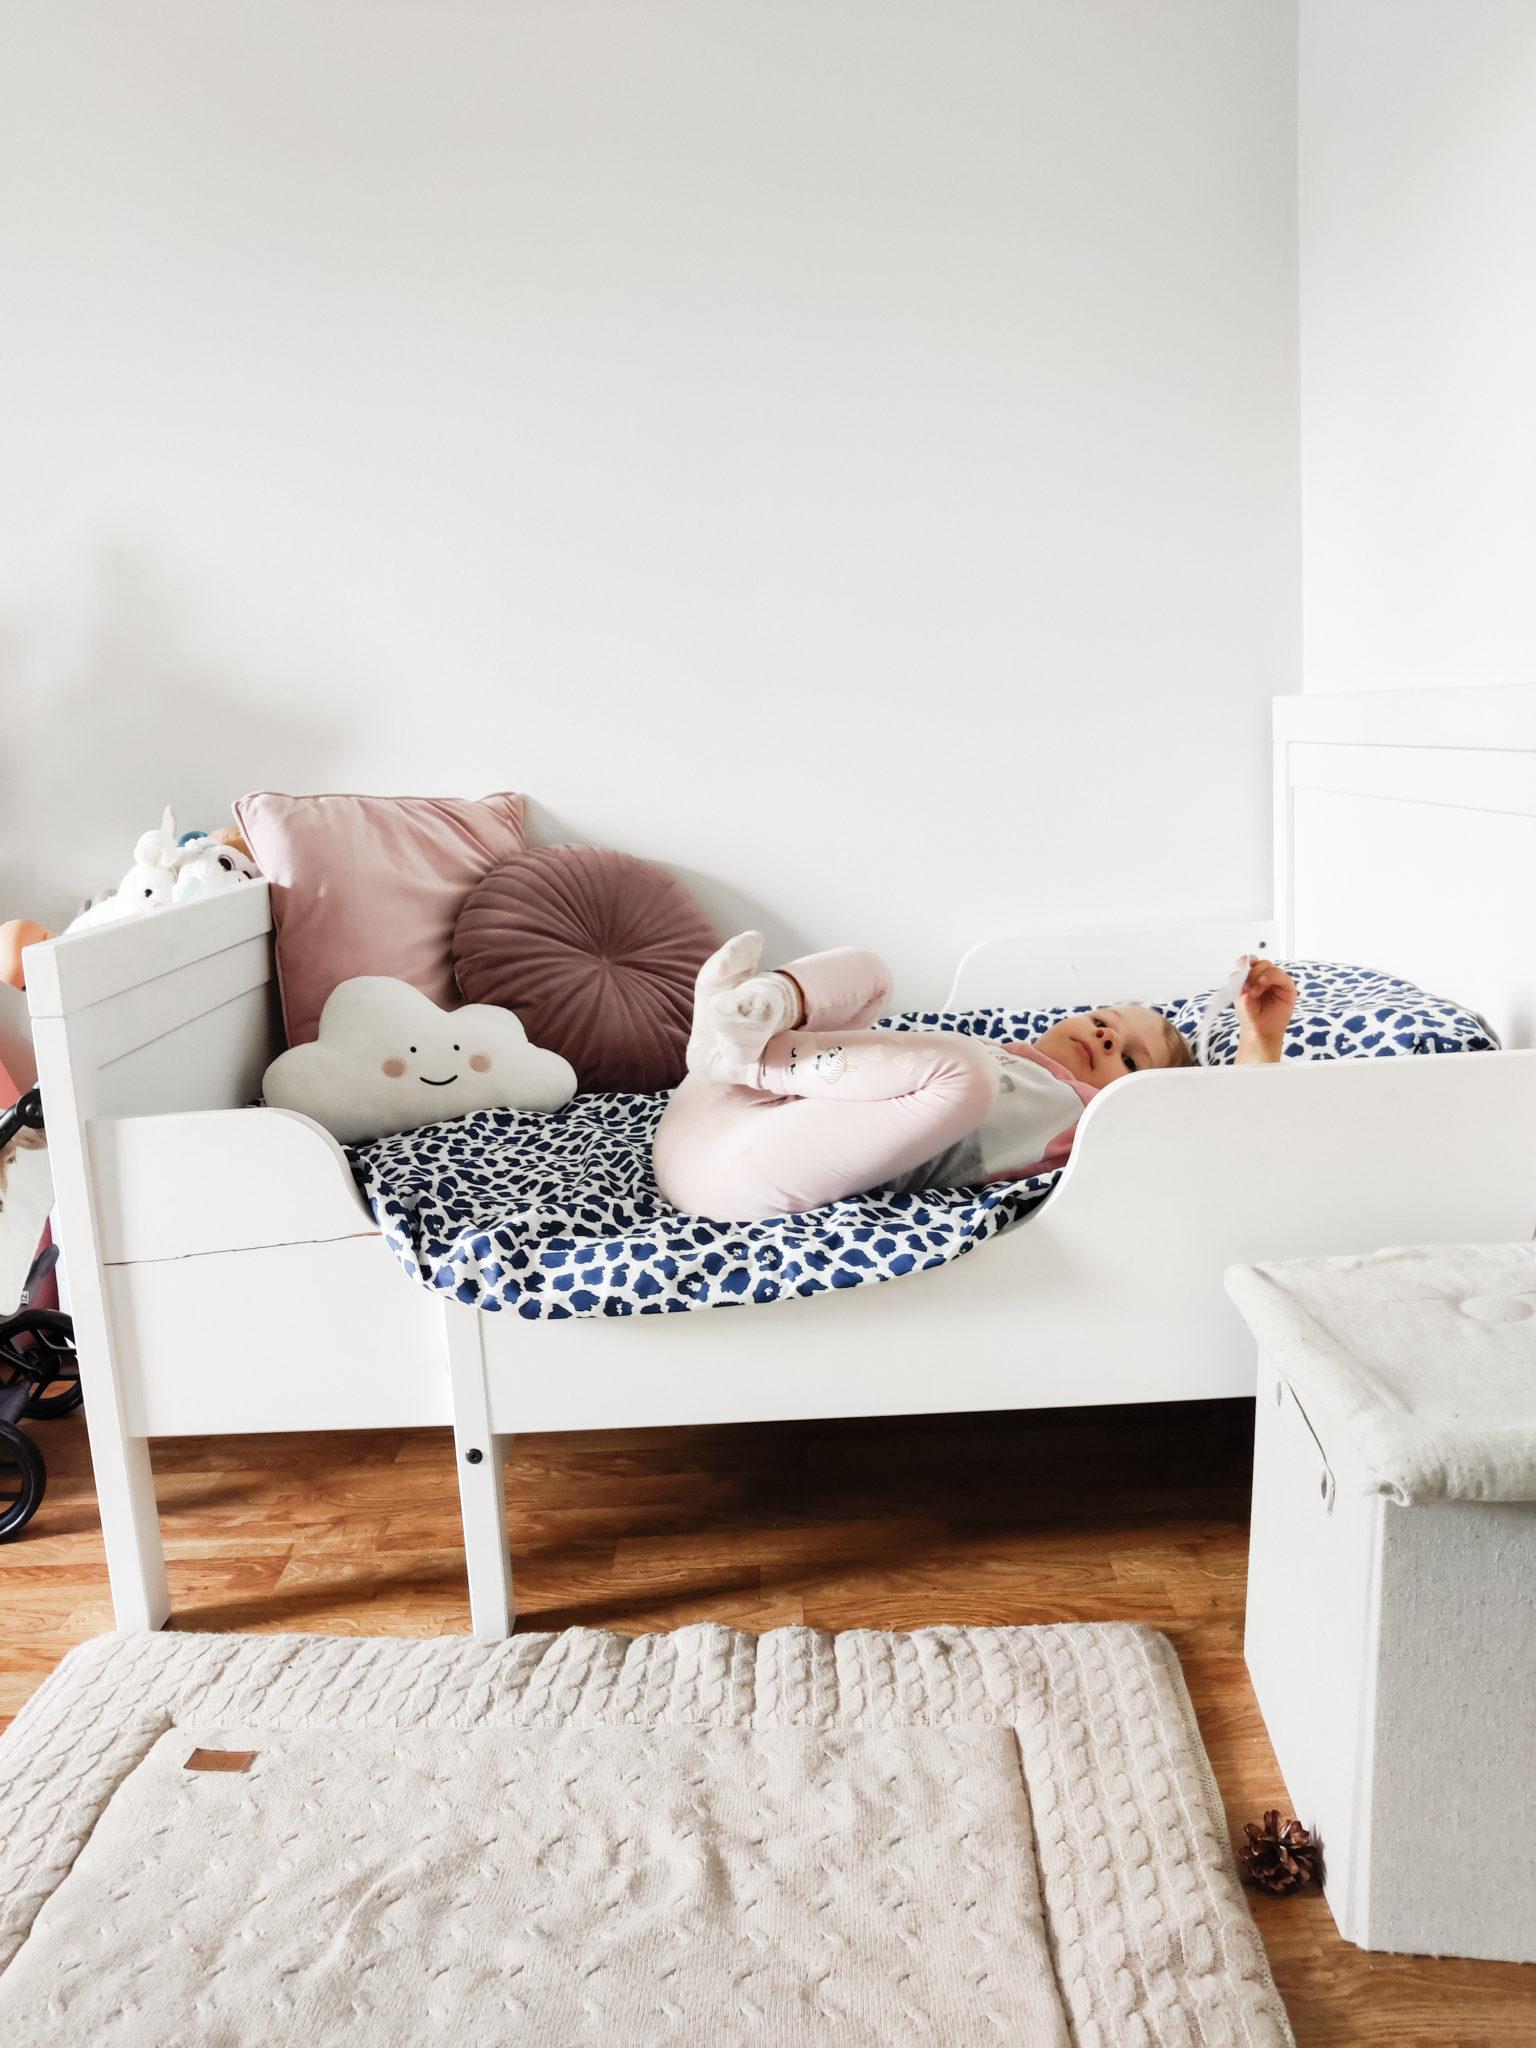 Jatkettava lastensänky - Ikea - BMH - Big mamas home by Jenni